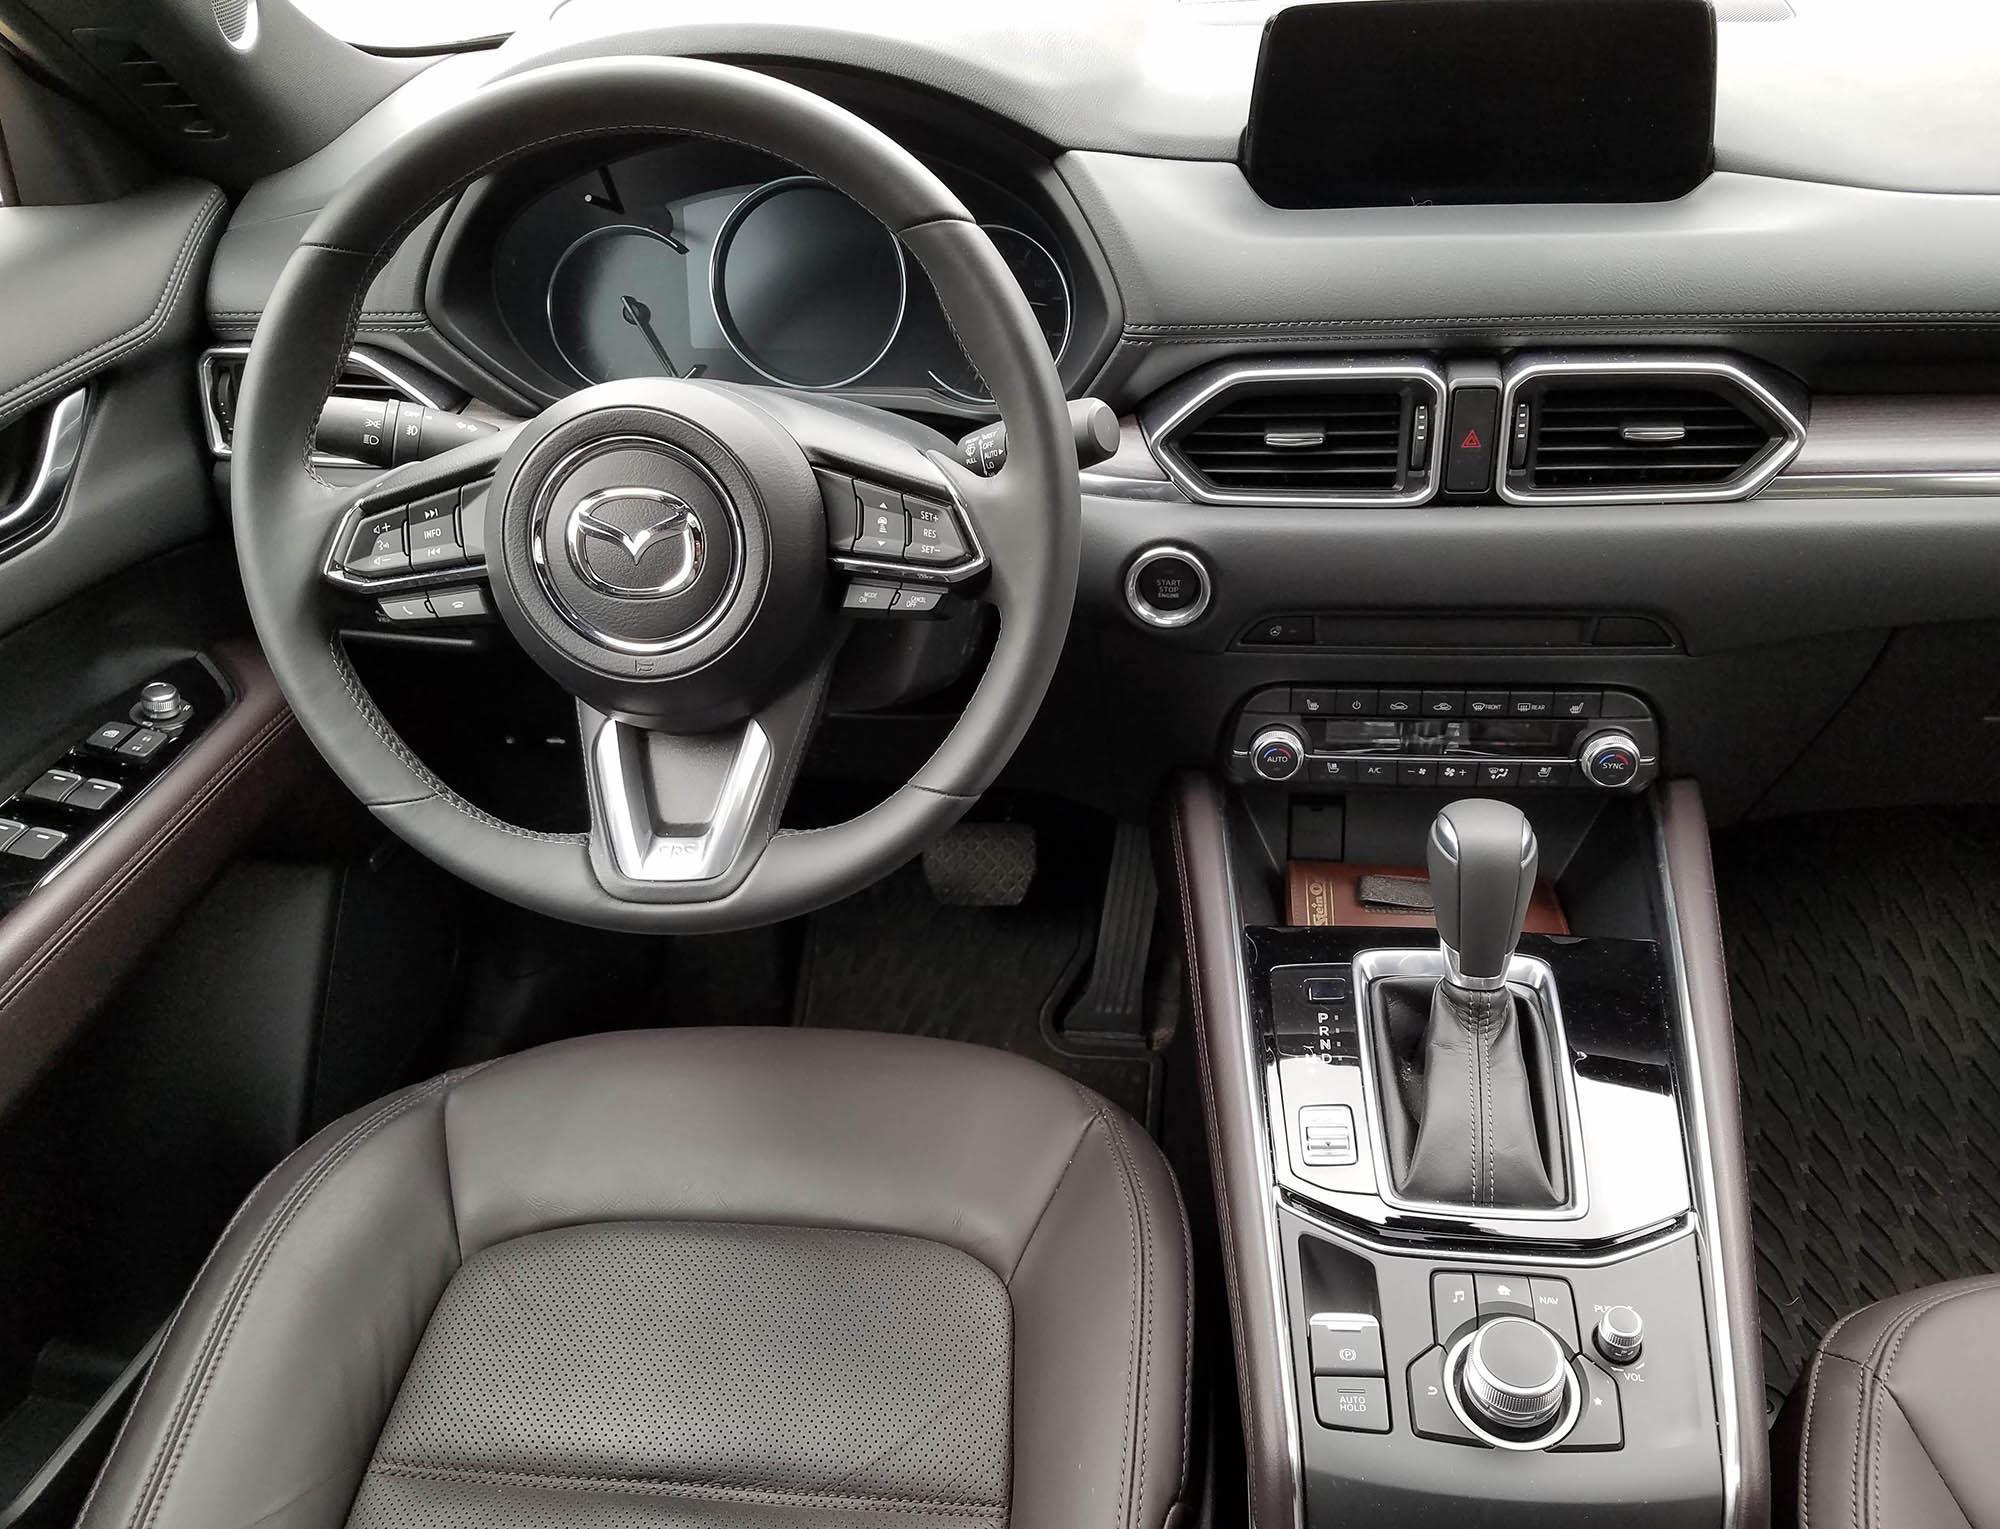 2019 Mazda CX-5: News, Upgrades, Price >> 2019 Mazda Cx 5 Signature Awd Review Looks Power Sports